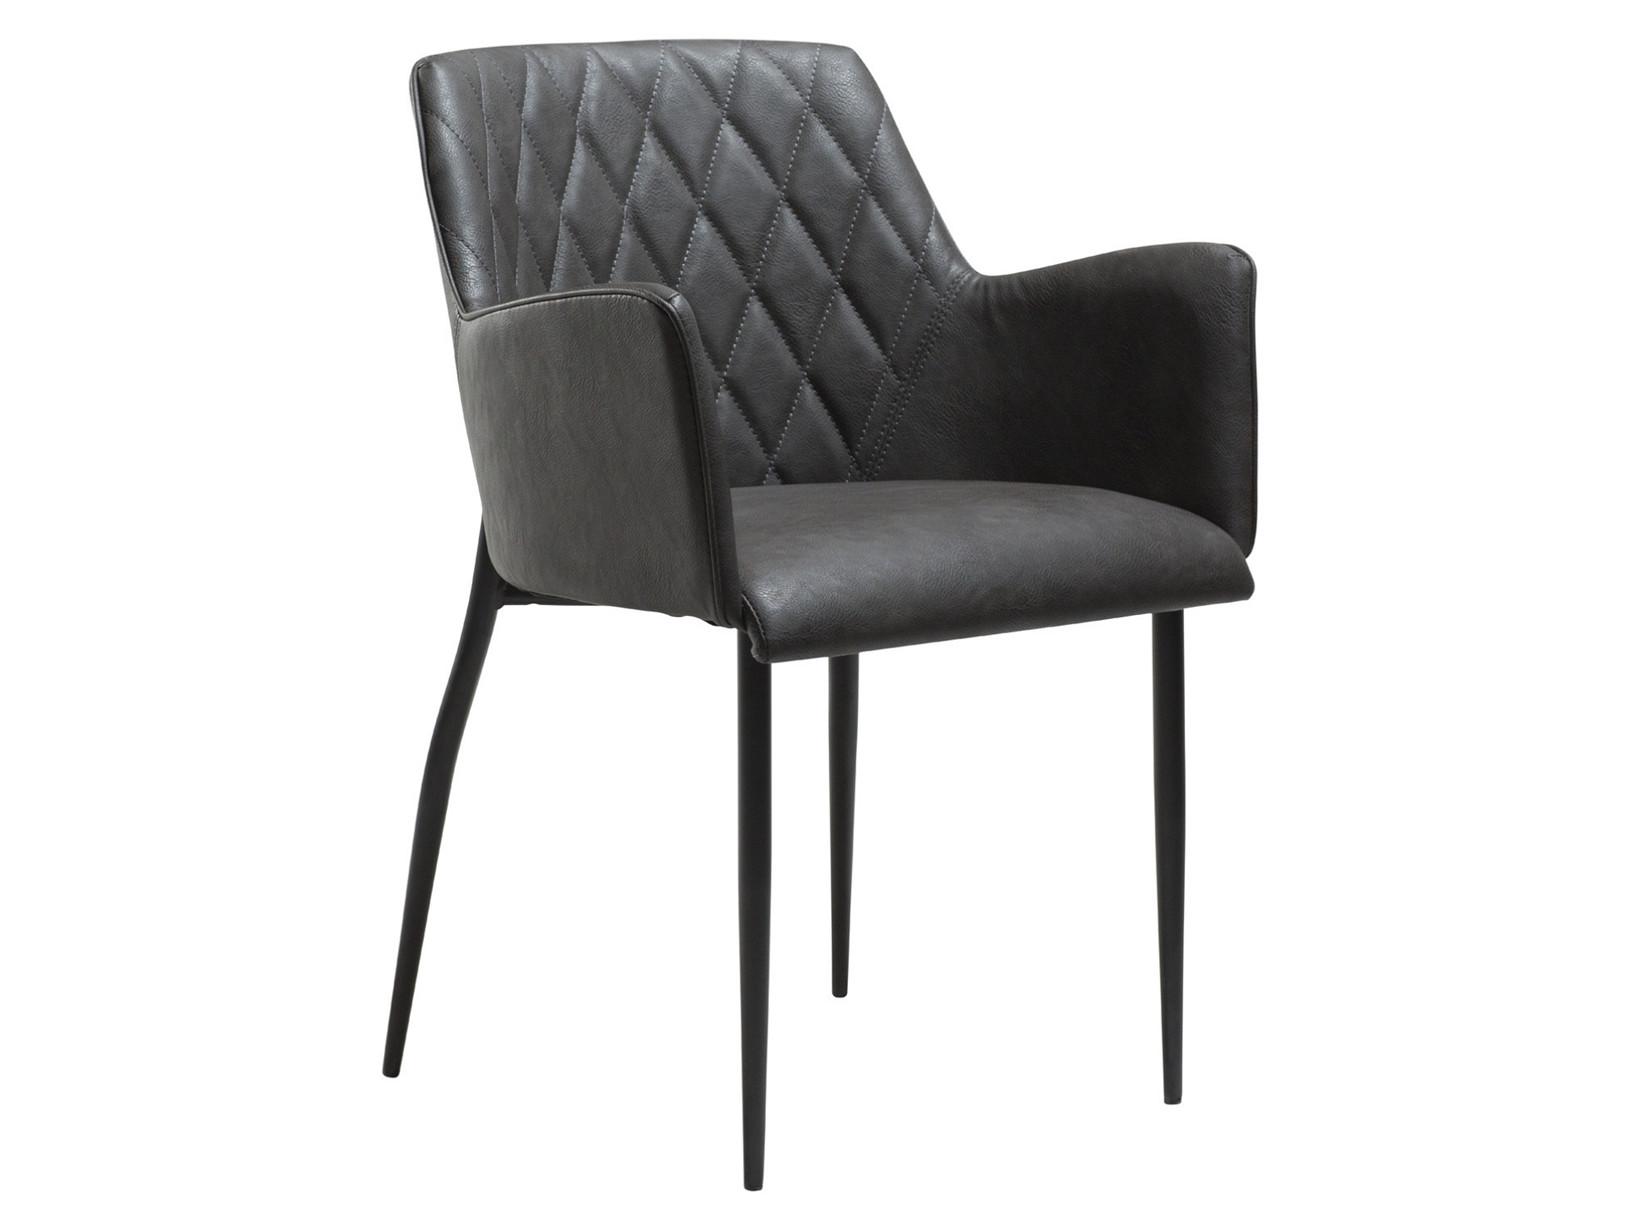 Rombo spisebordsstol - Grå læderlook